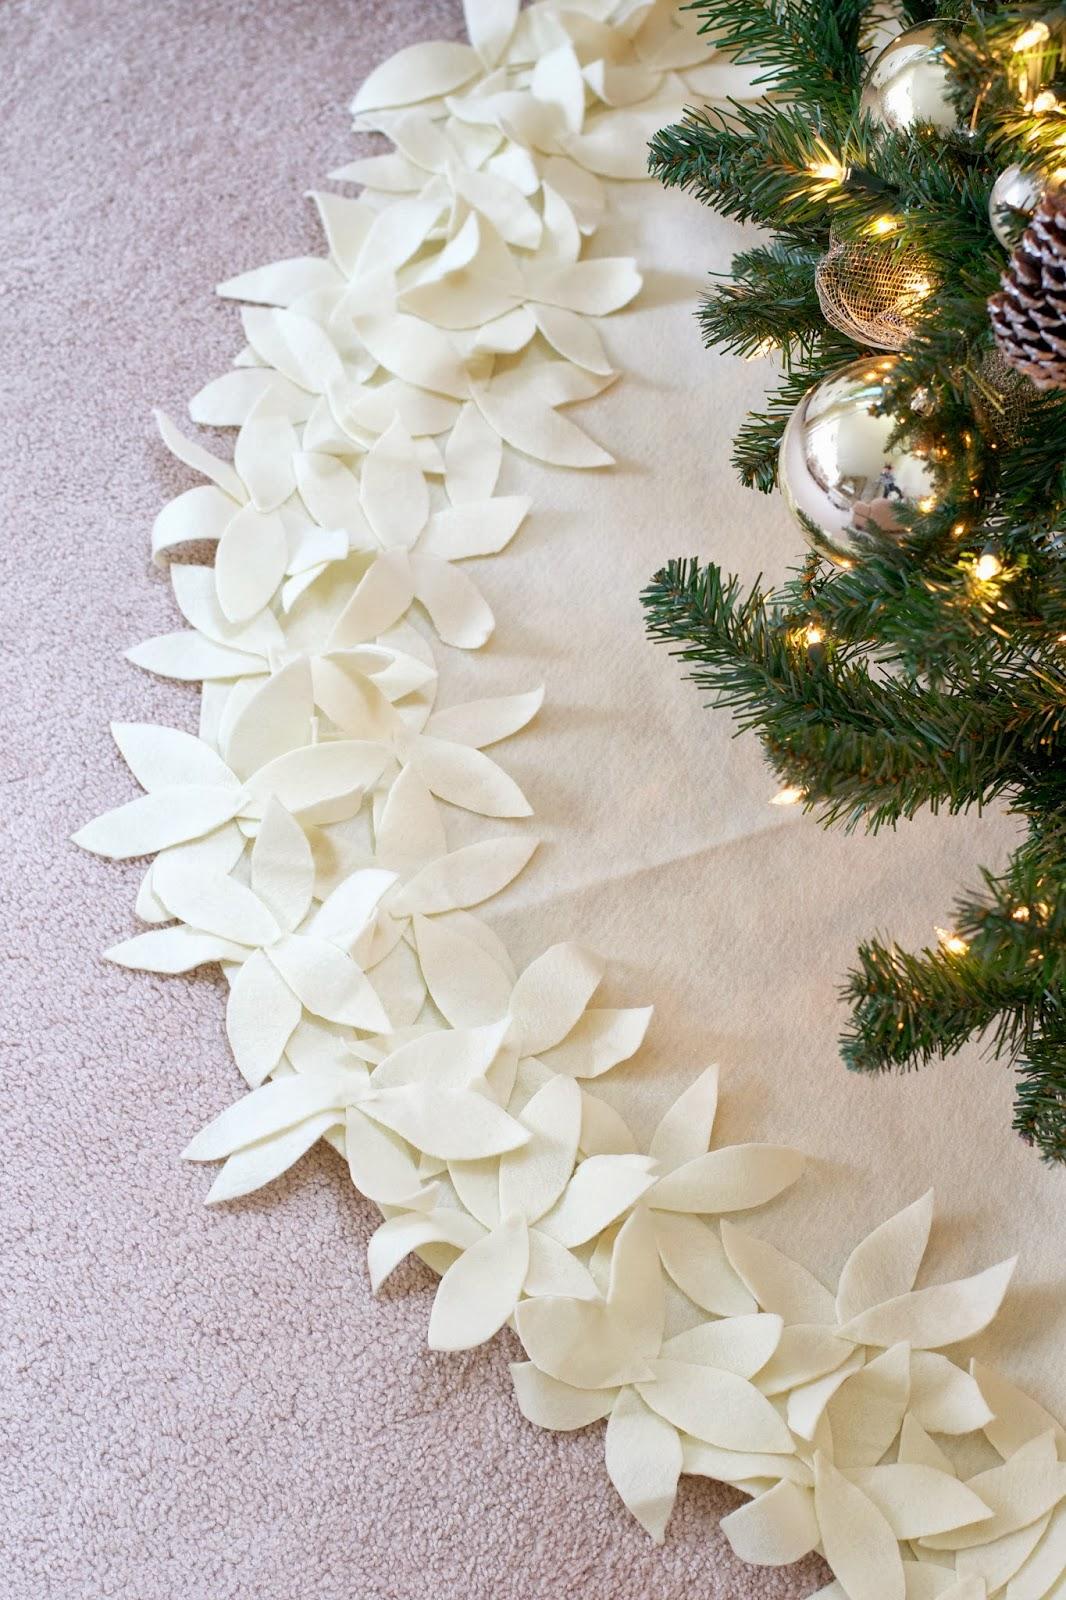 LiveLoveDIY: How To Make a NO-SEW Christmas Tree Skirt